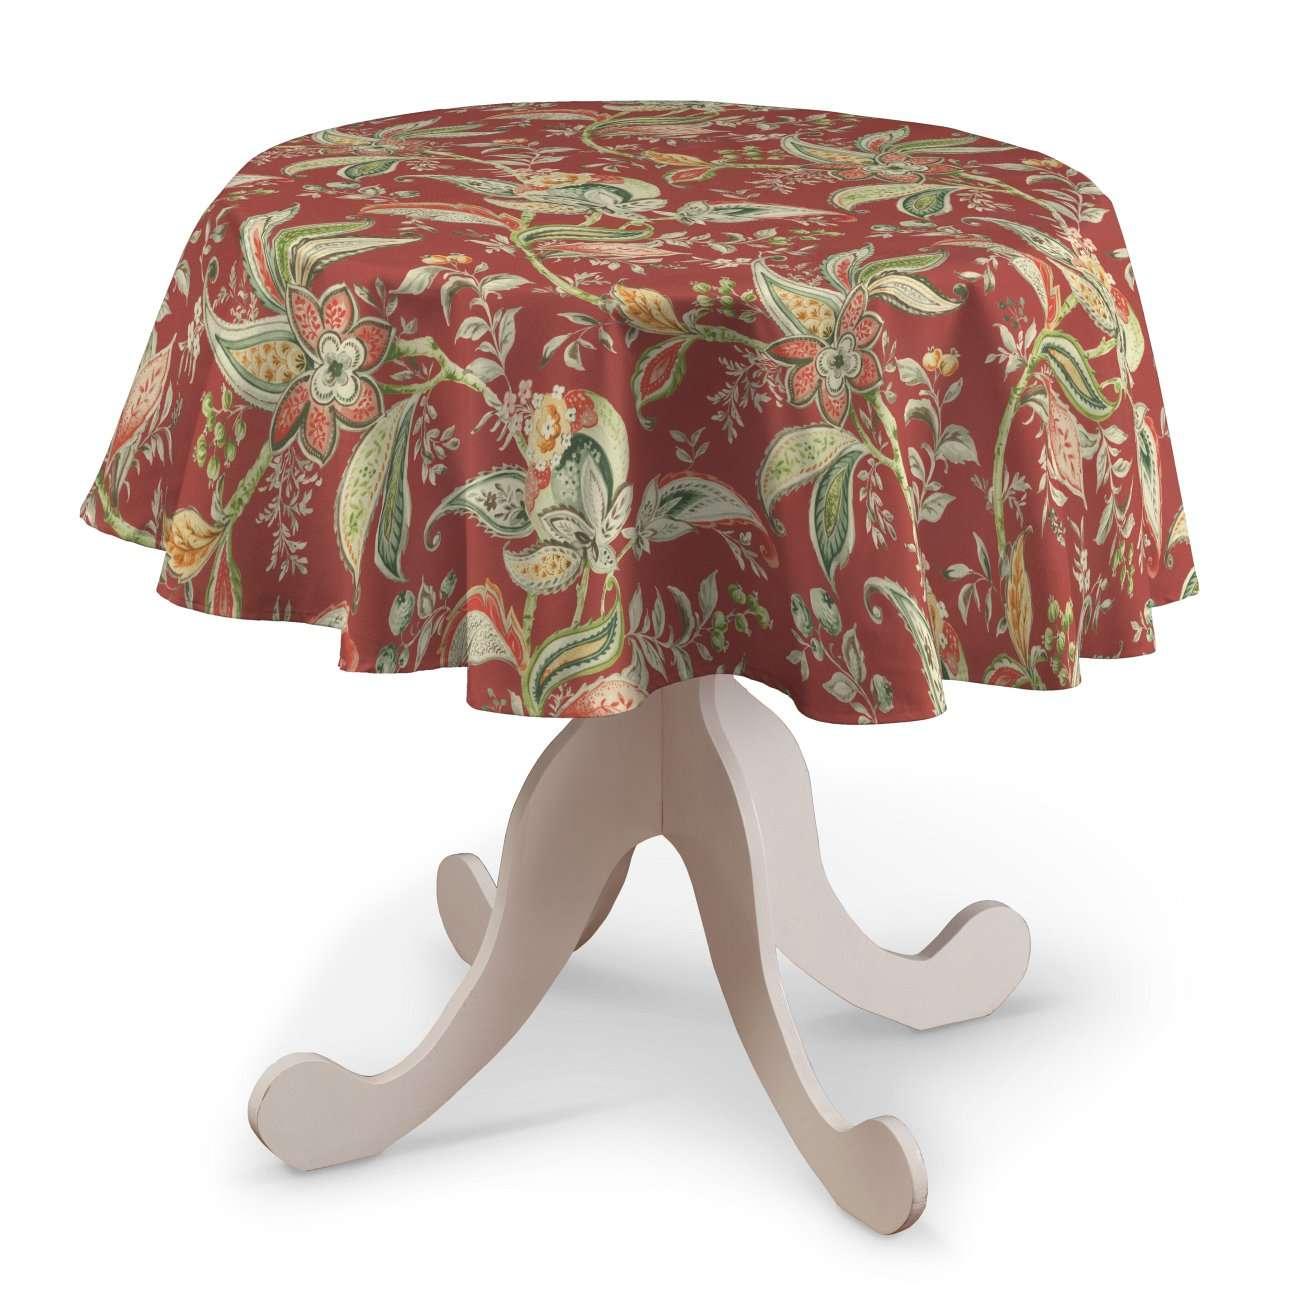 runde tischdecke rot 135 cm gardenia modecentren imc. Black Bedroom Furniture Sets. Home Design Ideas